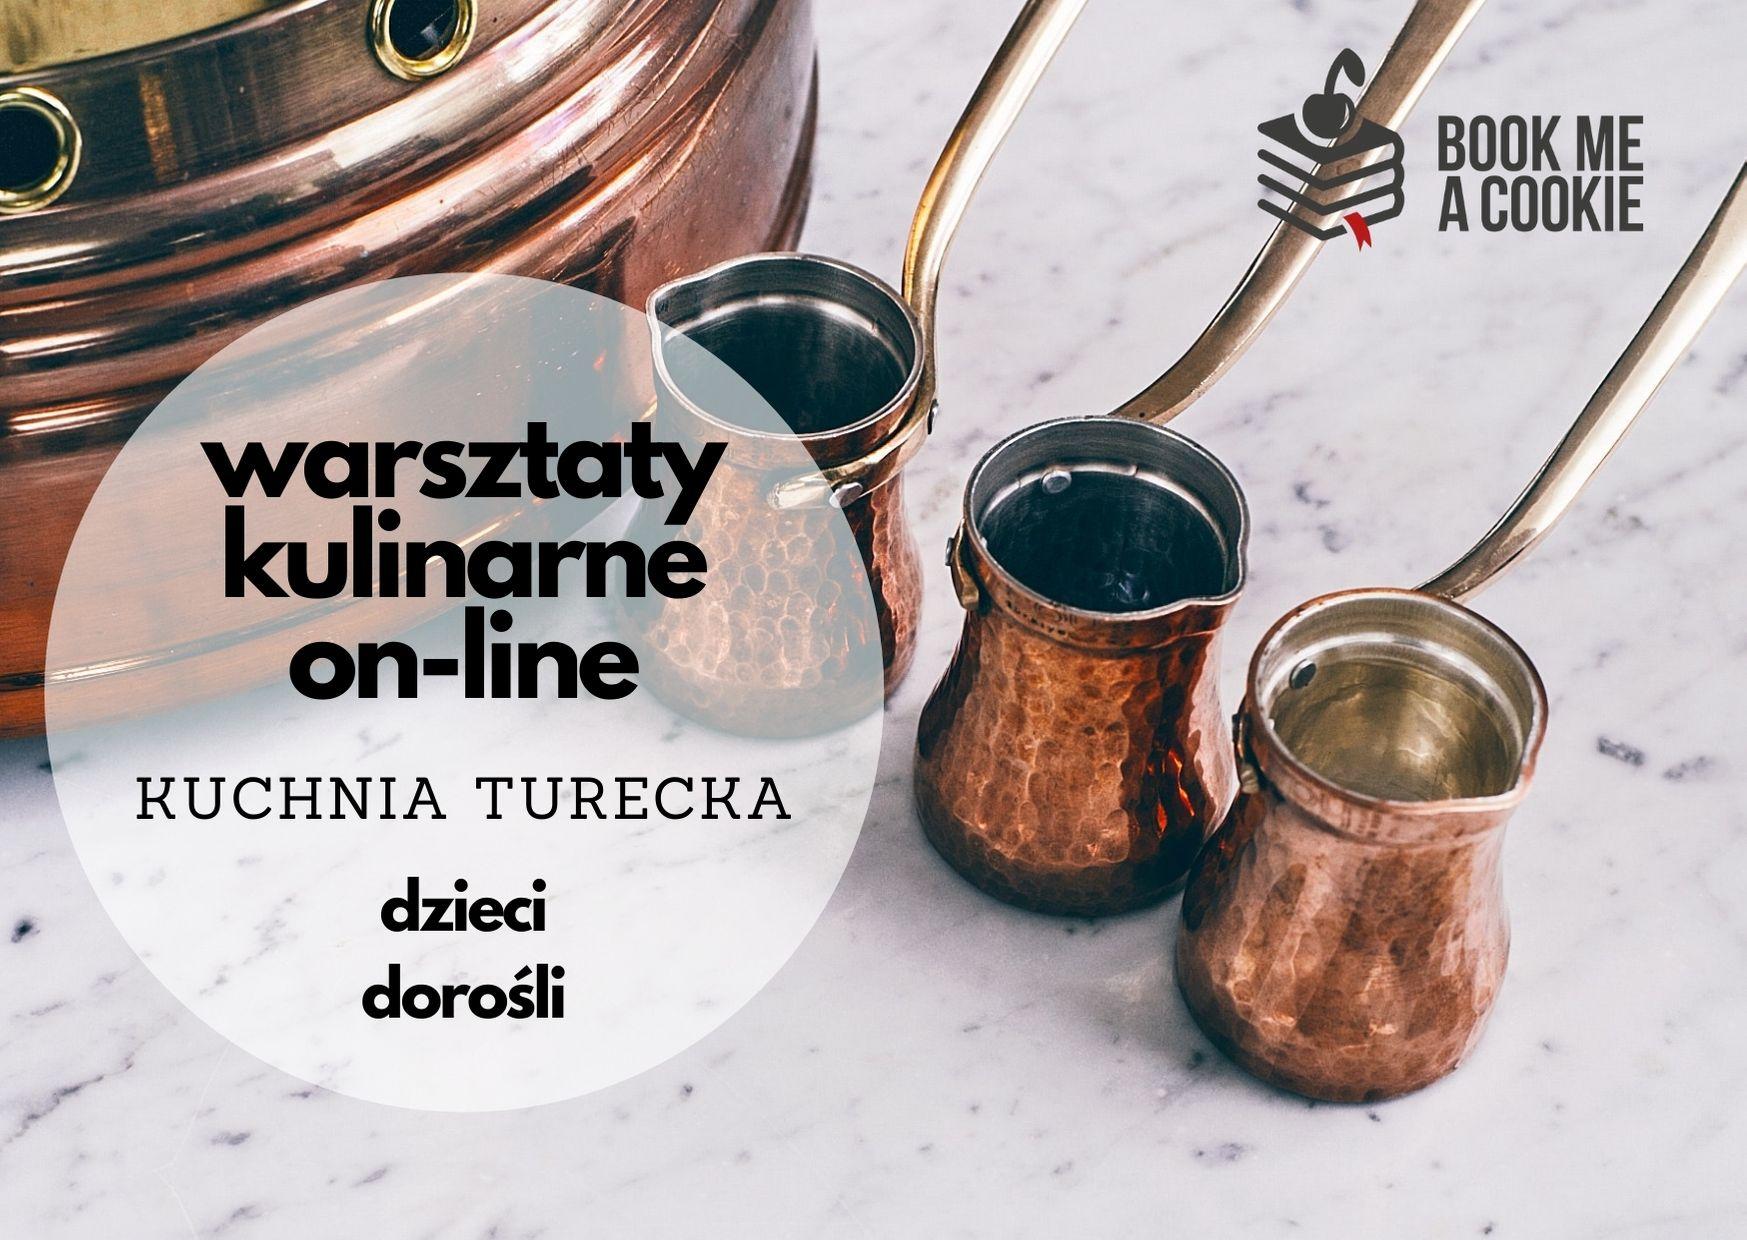 Warsztaty kulinarne on-line: Kuchnia turecka